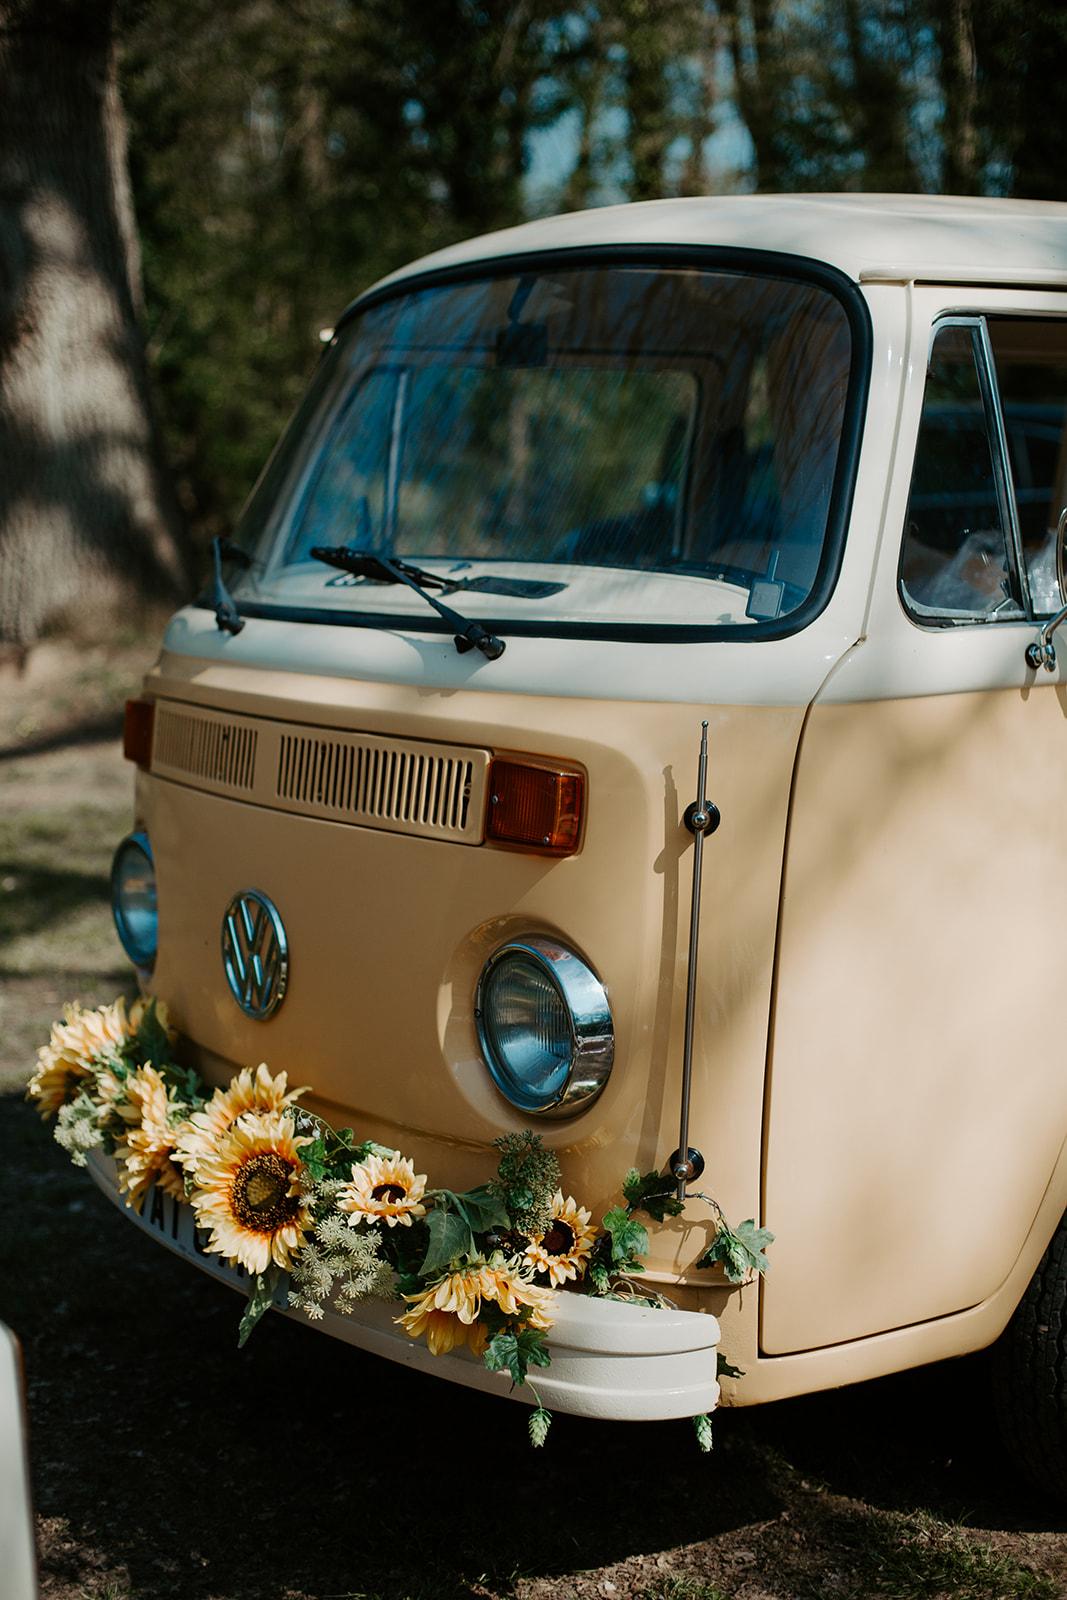 drive in wedding - camper van wedding - yellow wedding camper van with sunflowers - unique wedding transport - hippie wedding - boho wedding